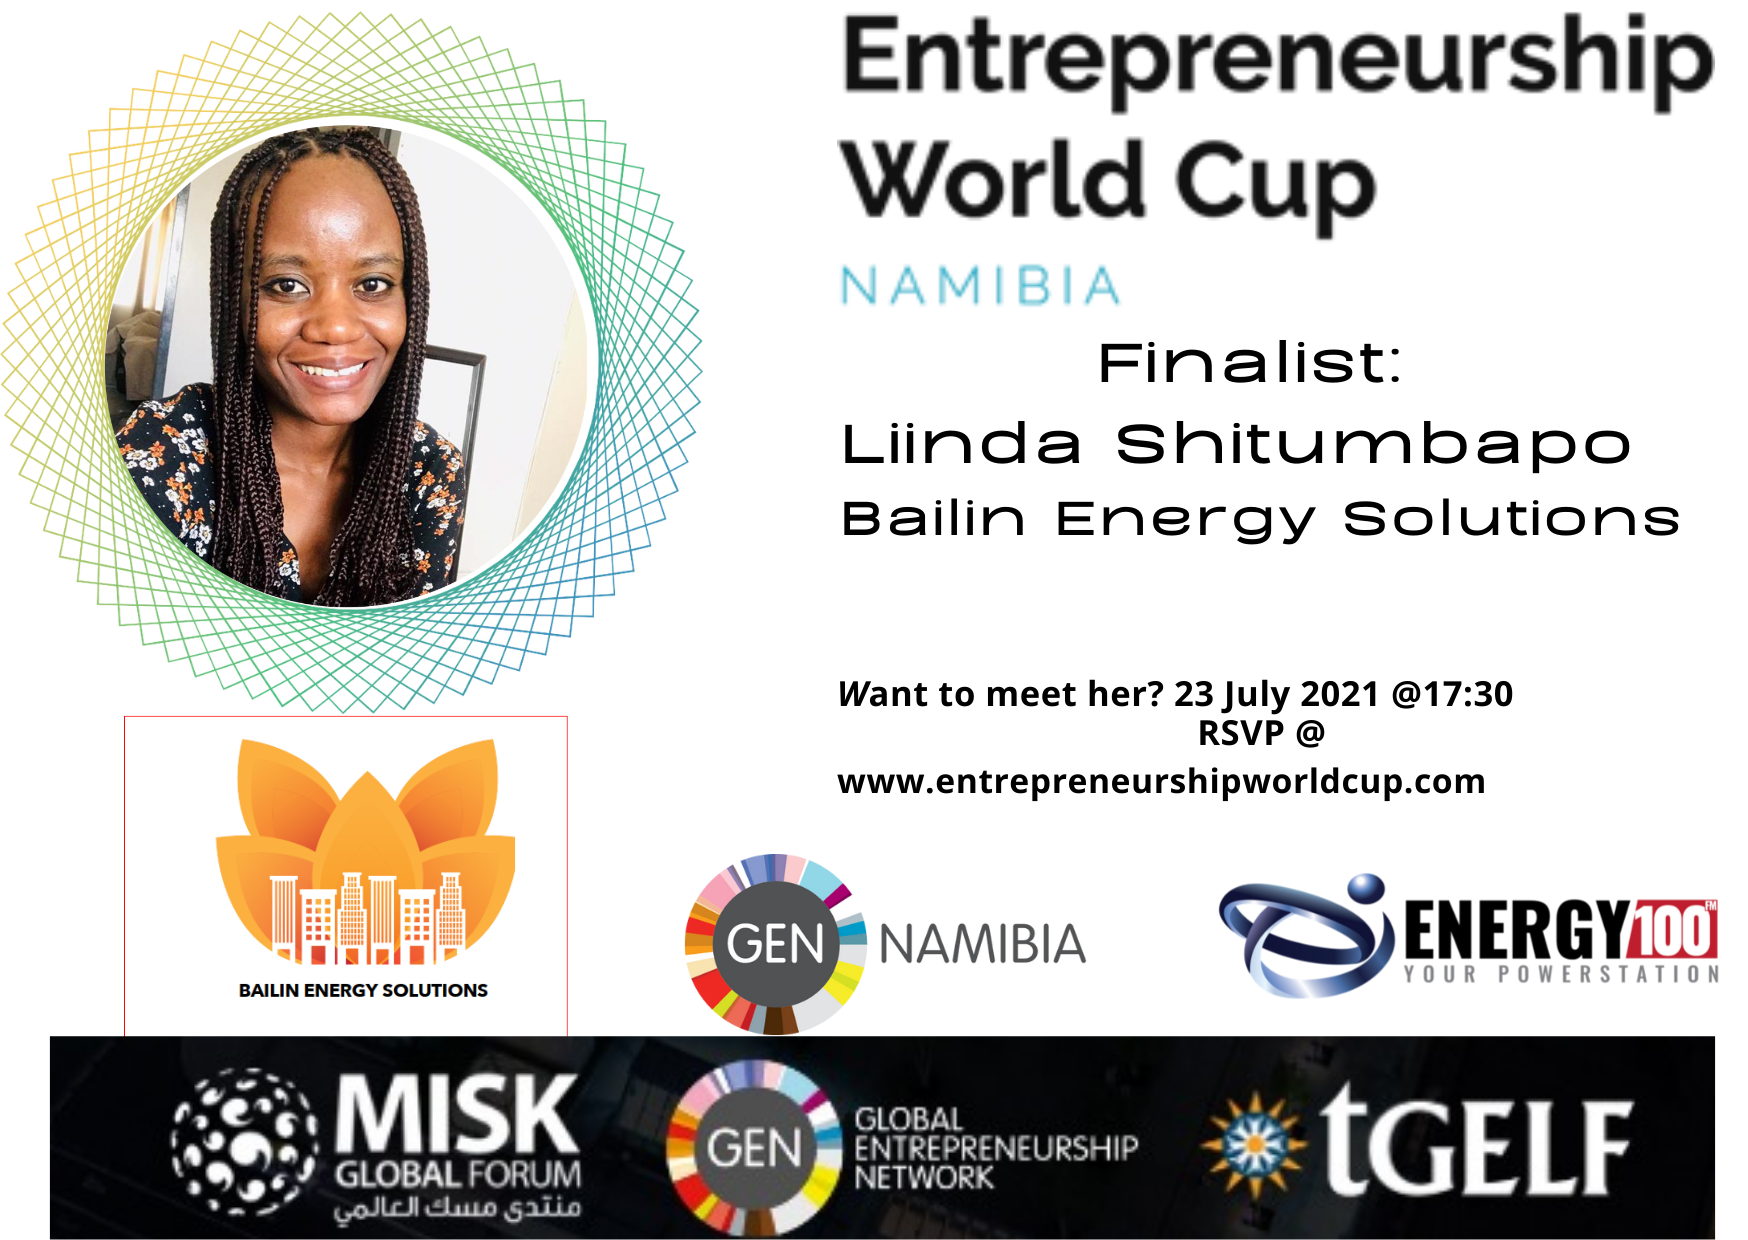 Linda Shitumbapo, Bailin Energy